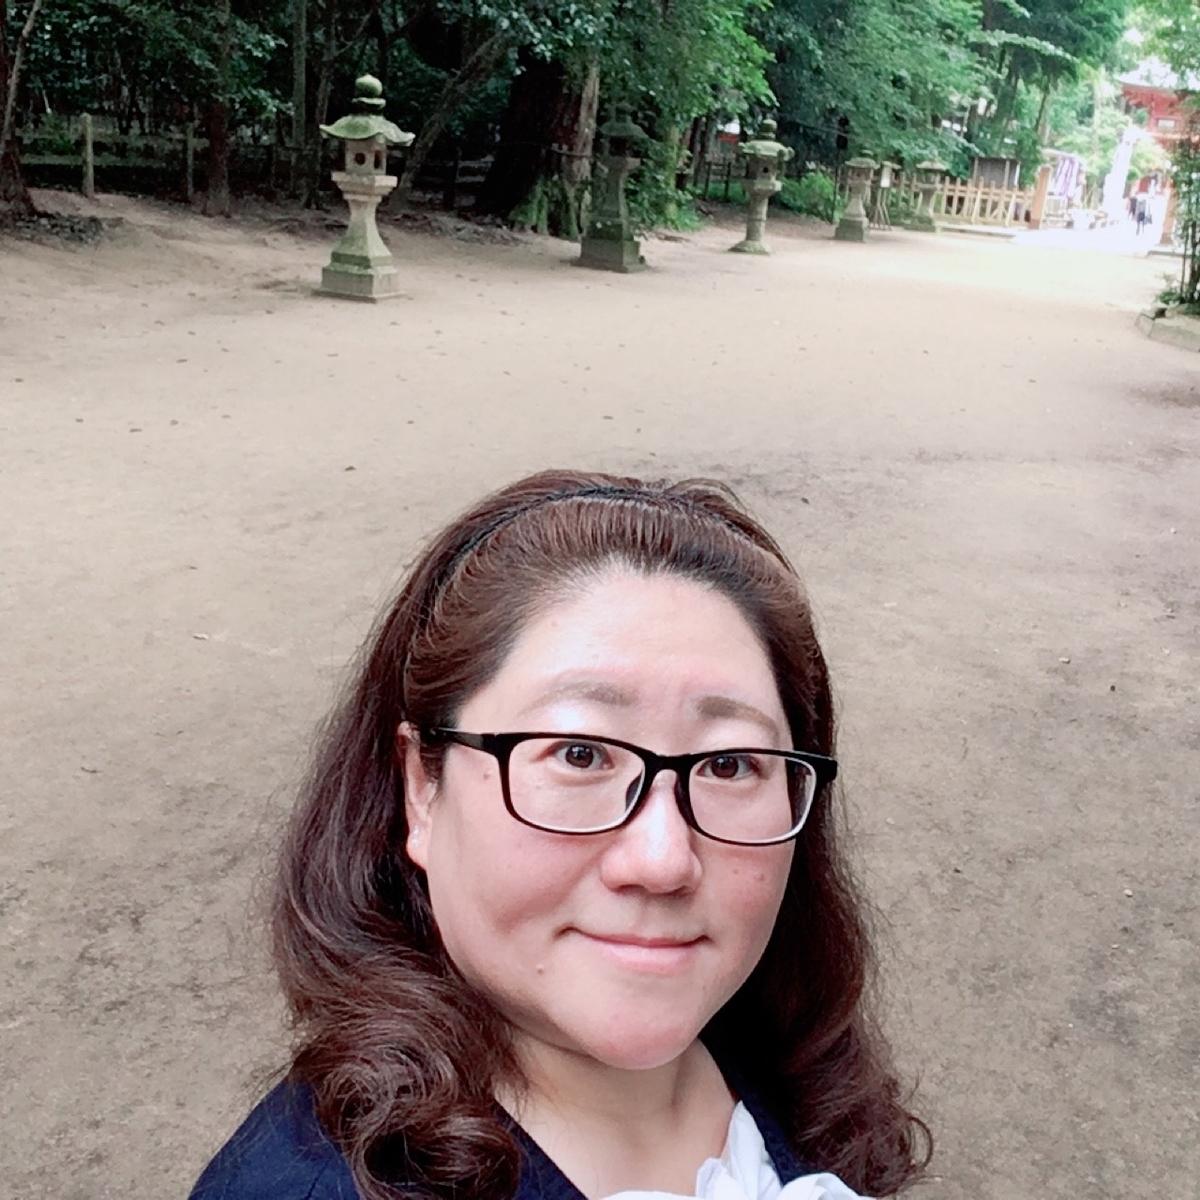 f:id:amane-yuuna:20200630231246j:plain